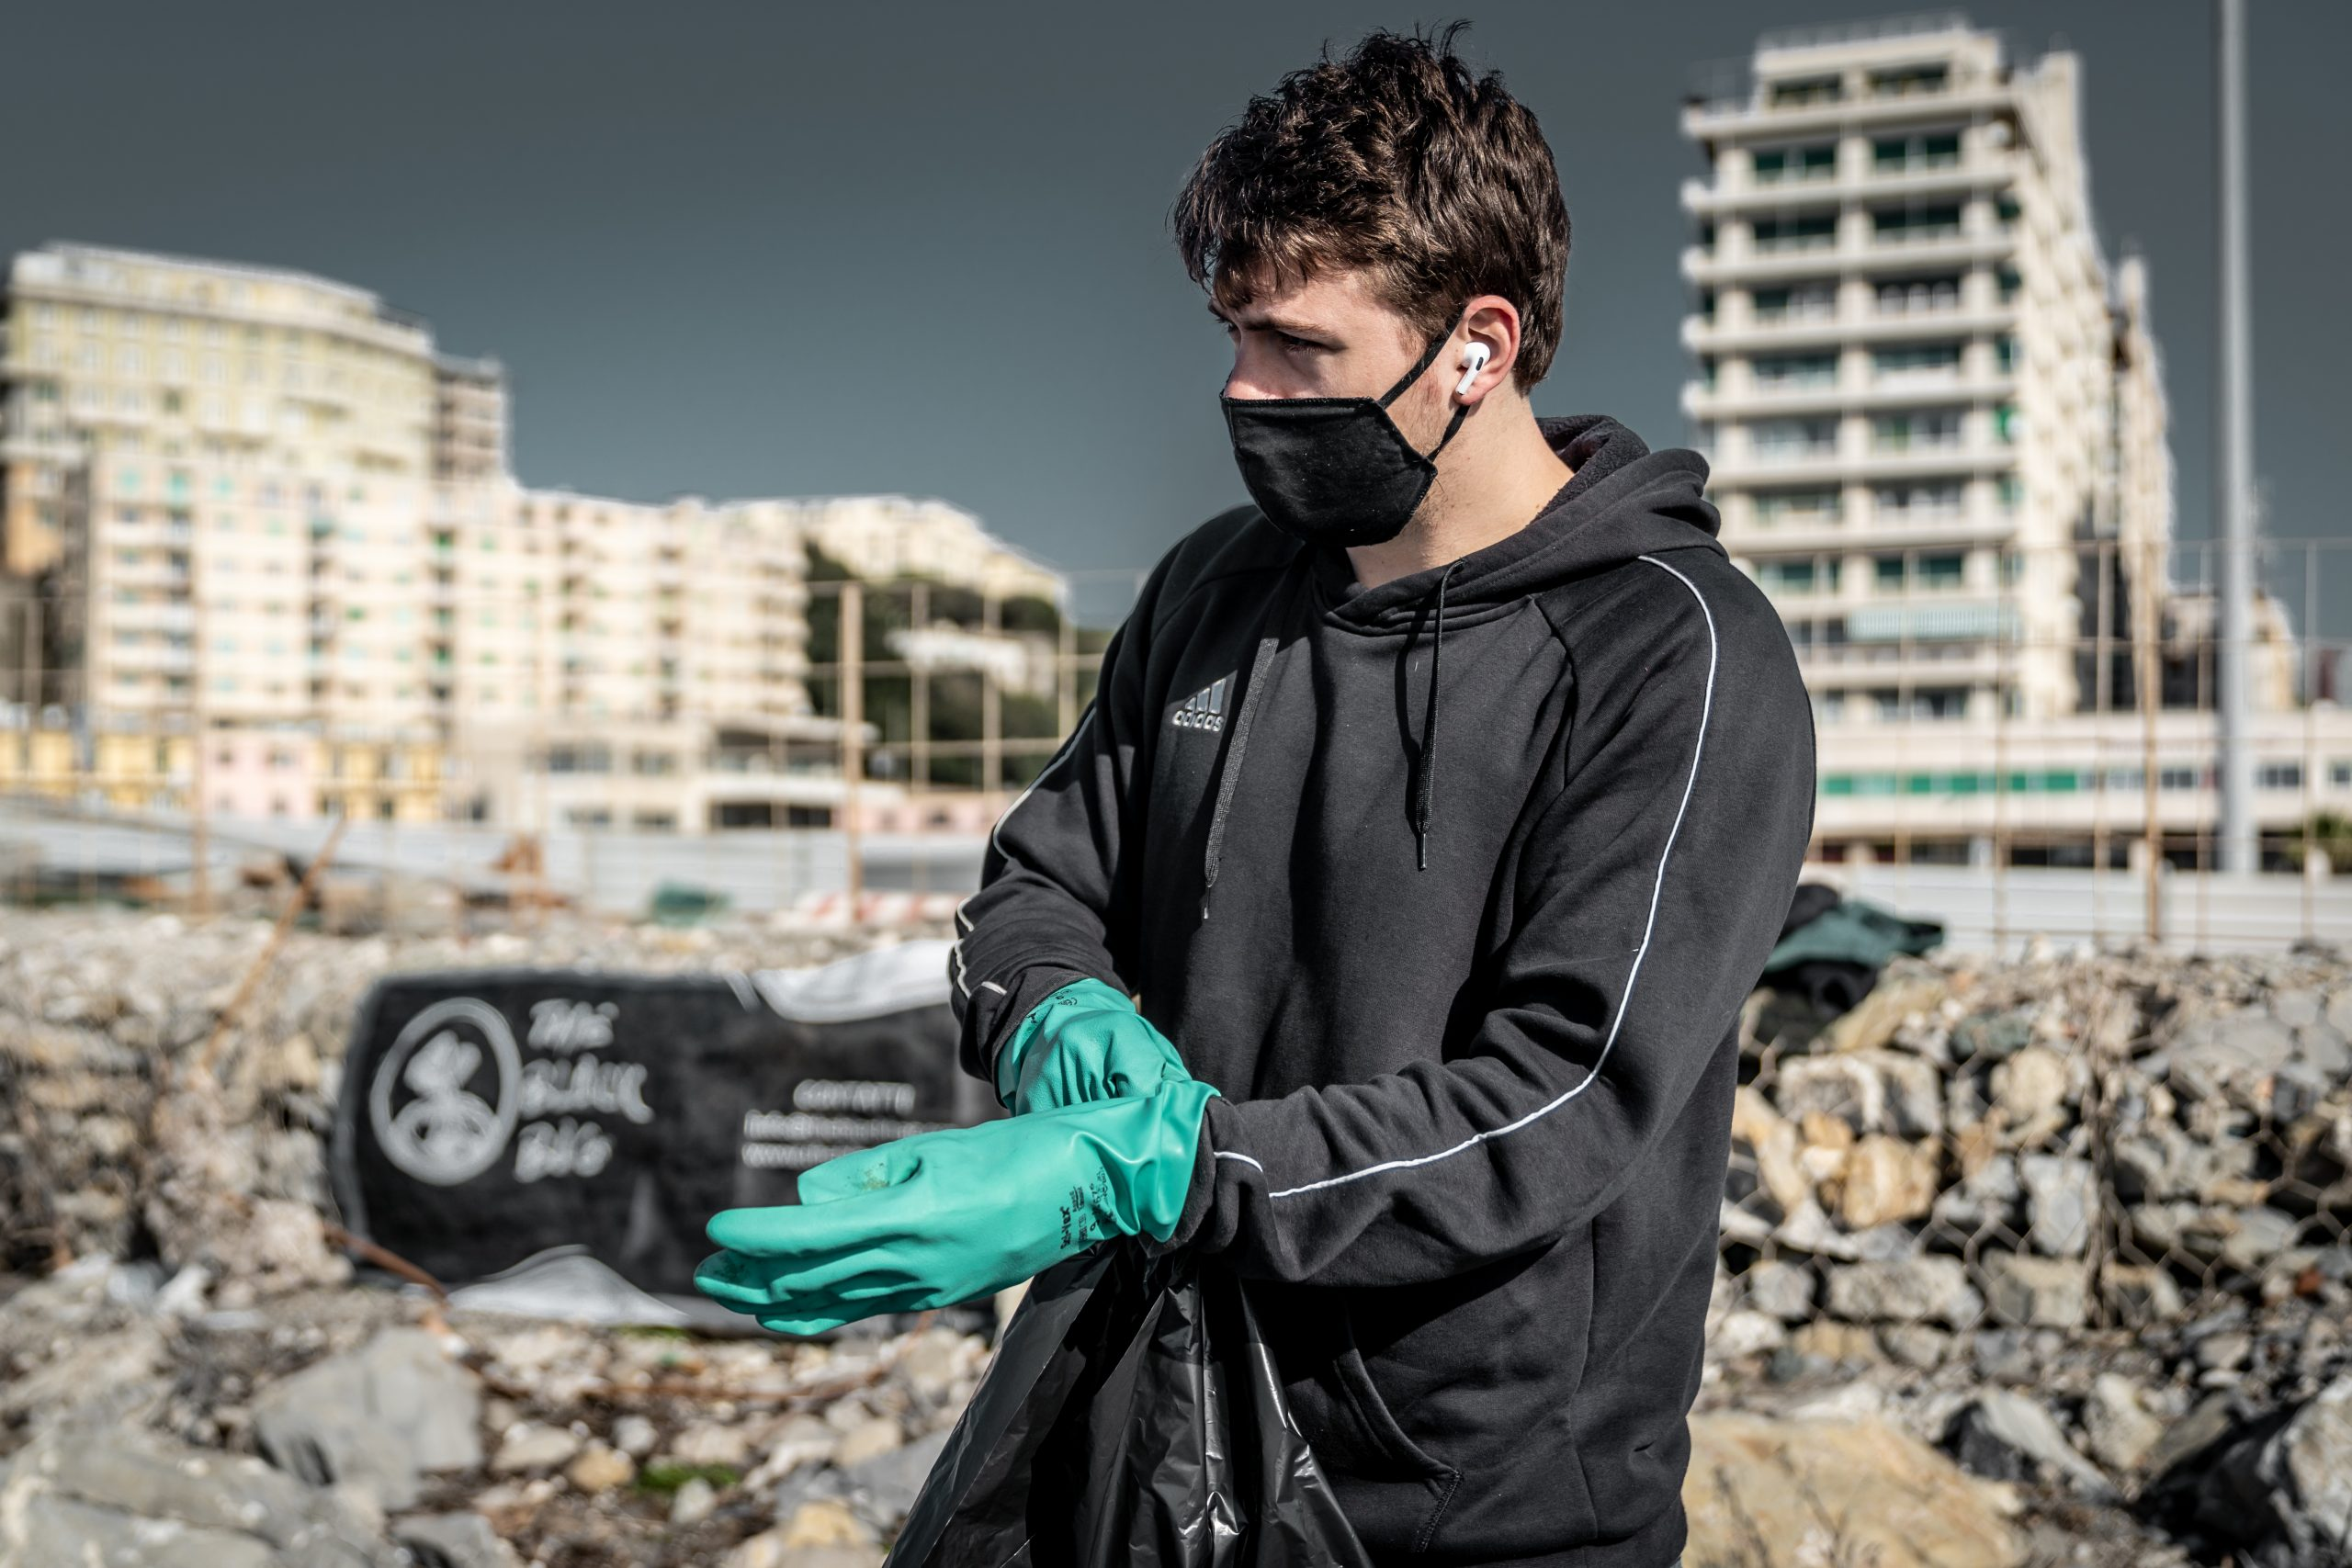 The Black Bag, l'associazione di tutela ambientale nata pulendo le spiagge in Liguria